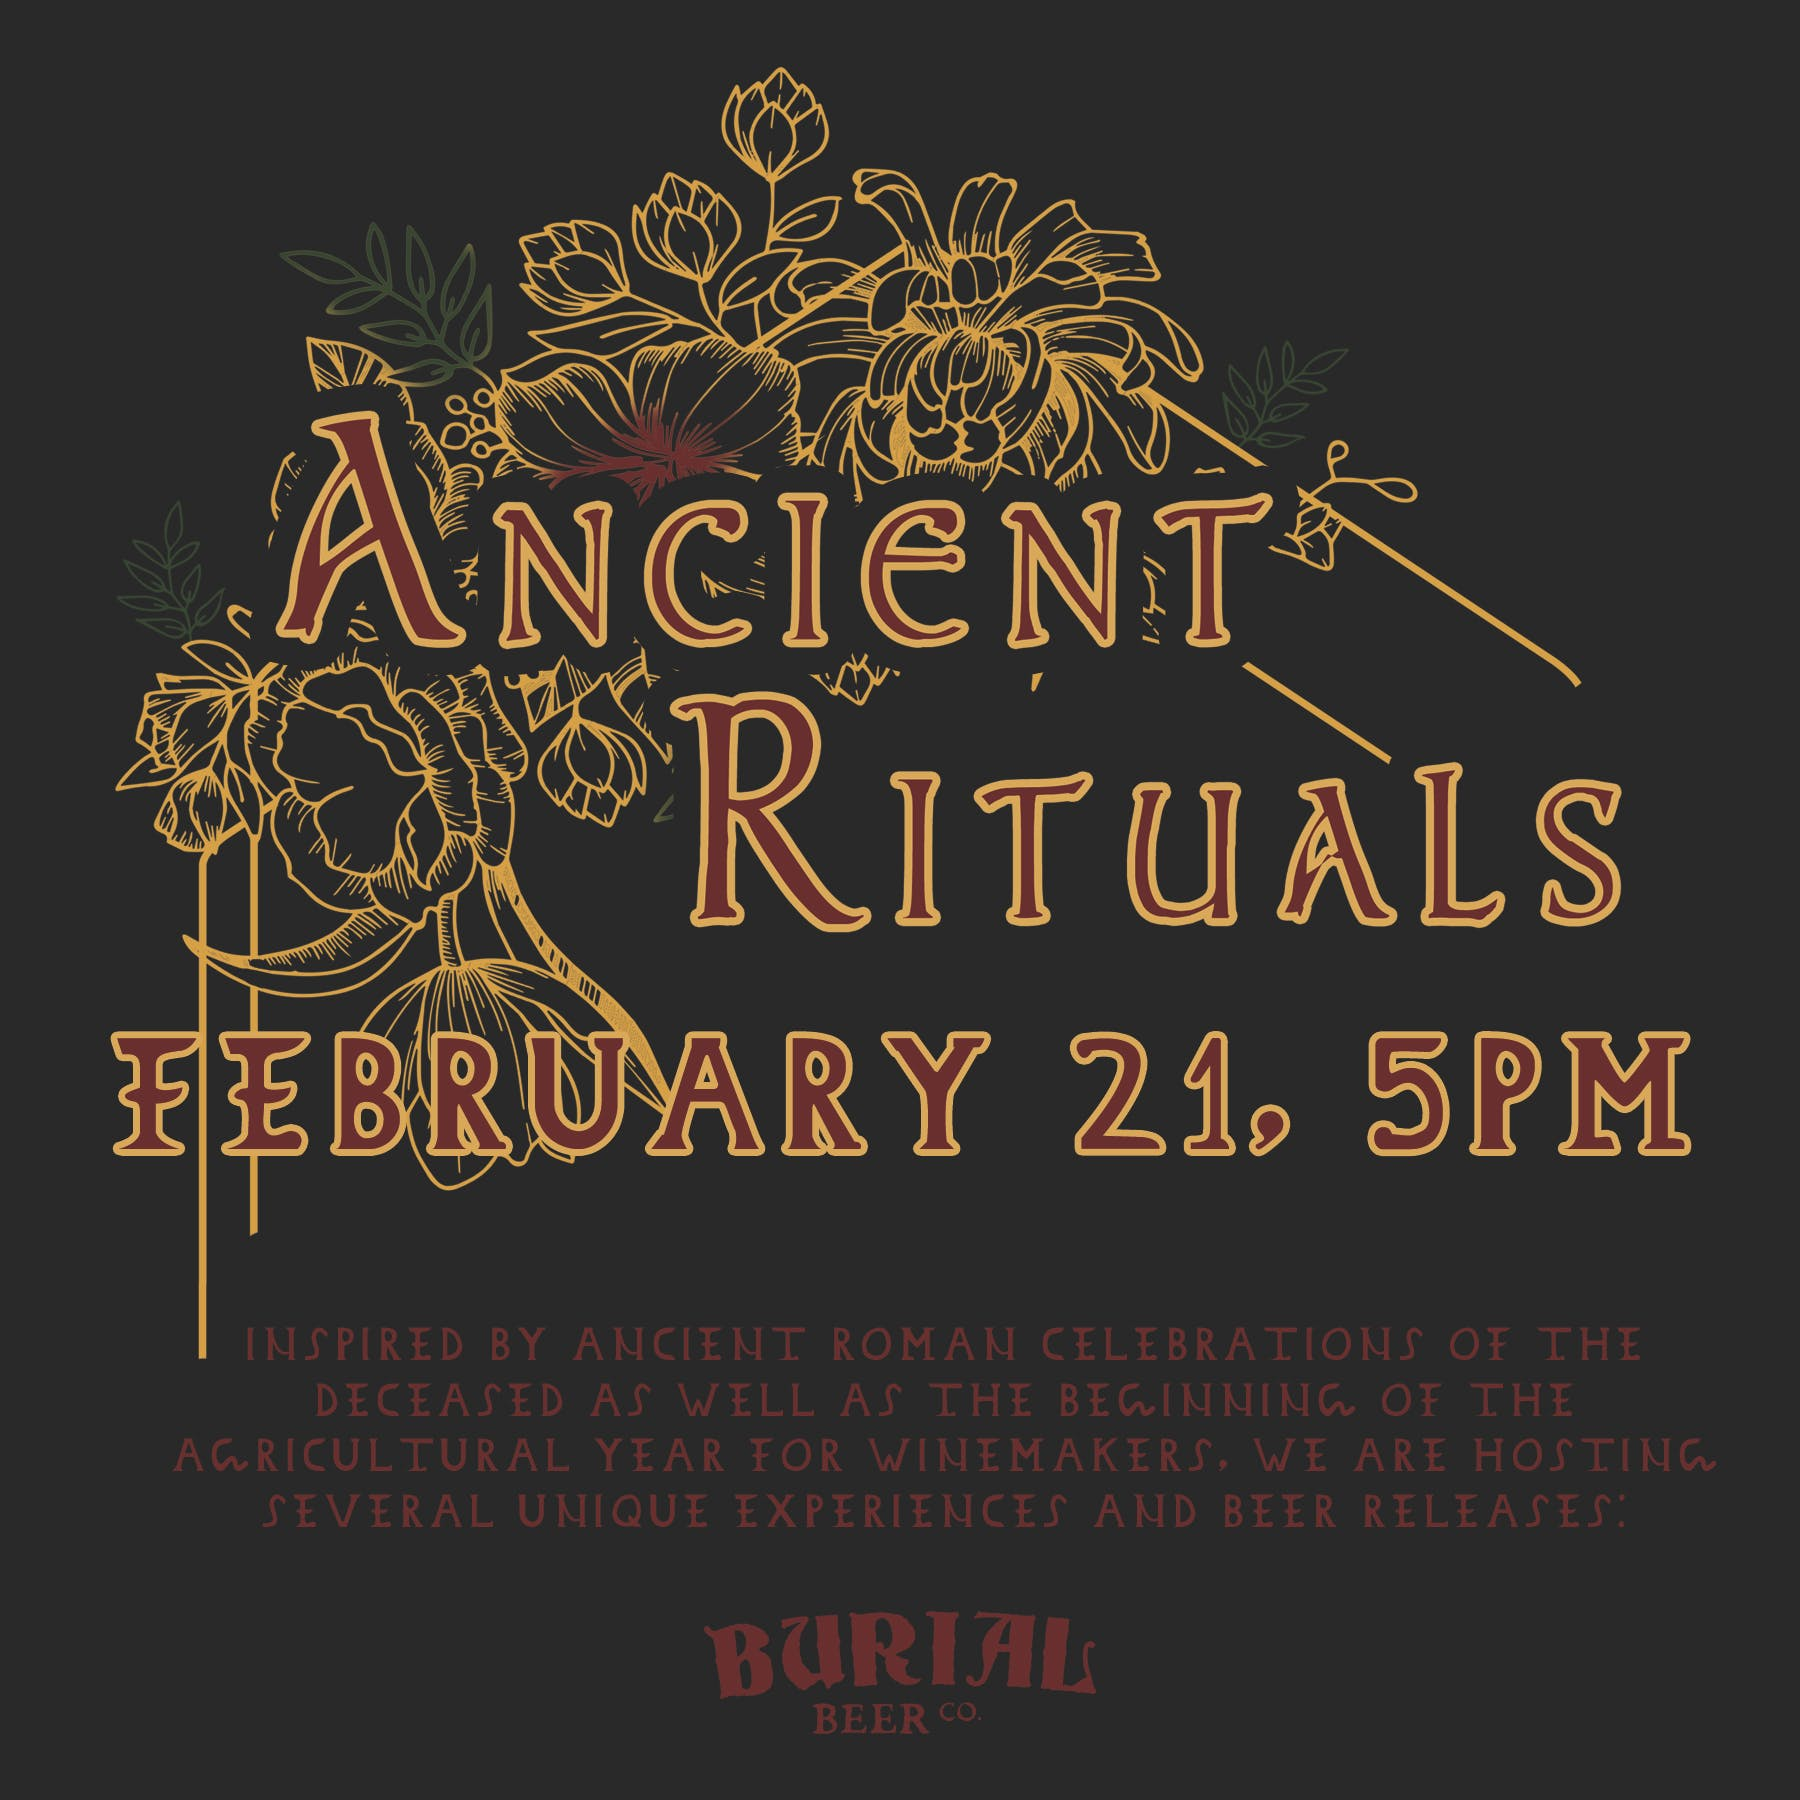 Ancient Ritual: A Celebration of Remembrance